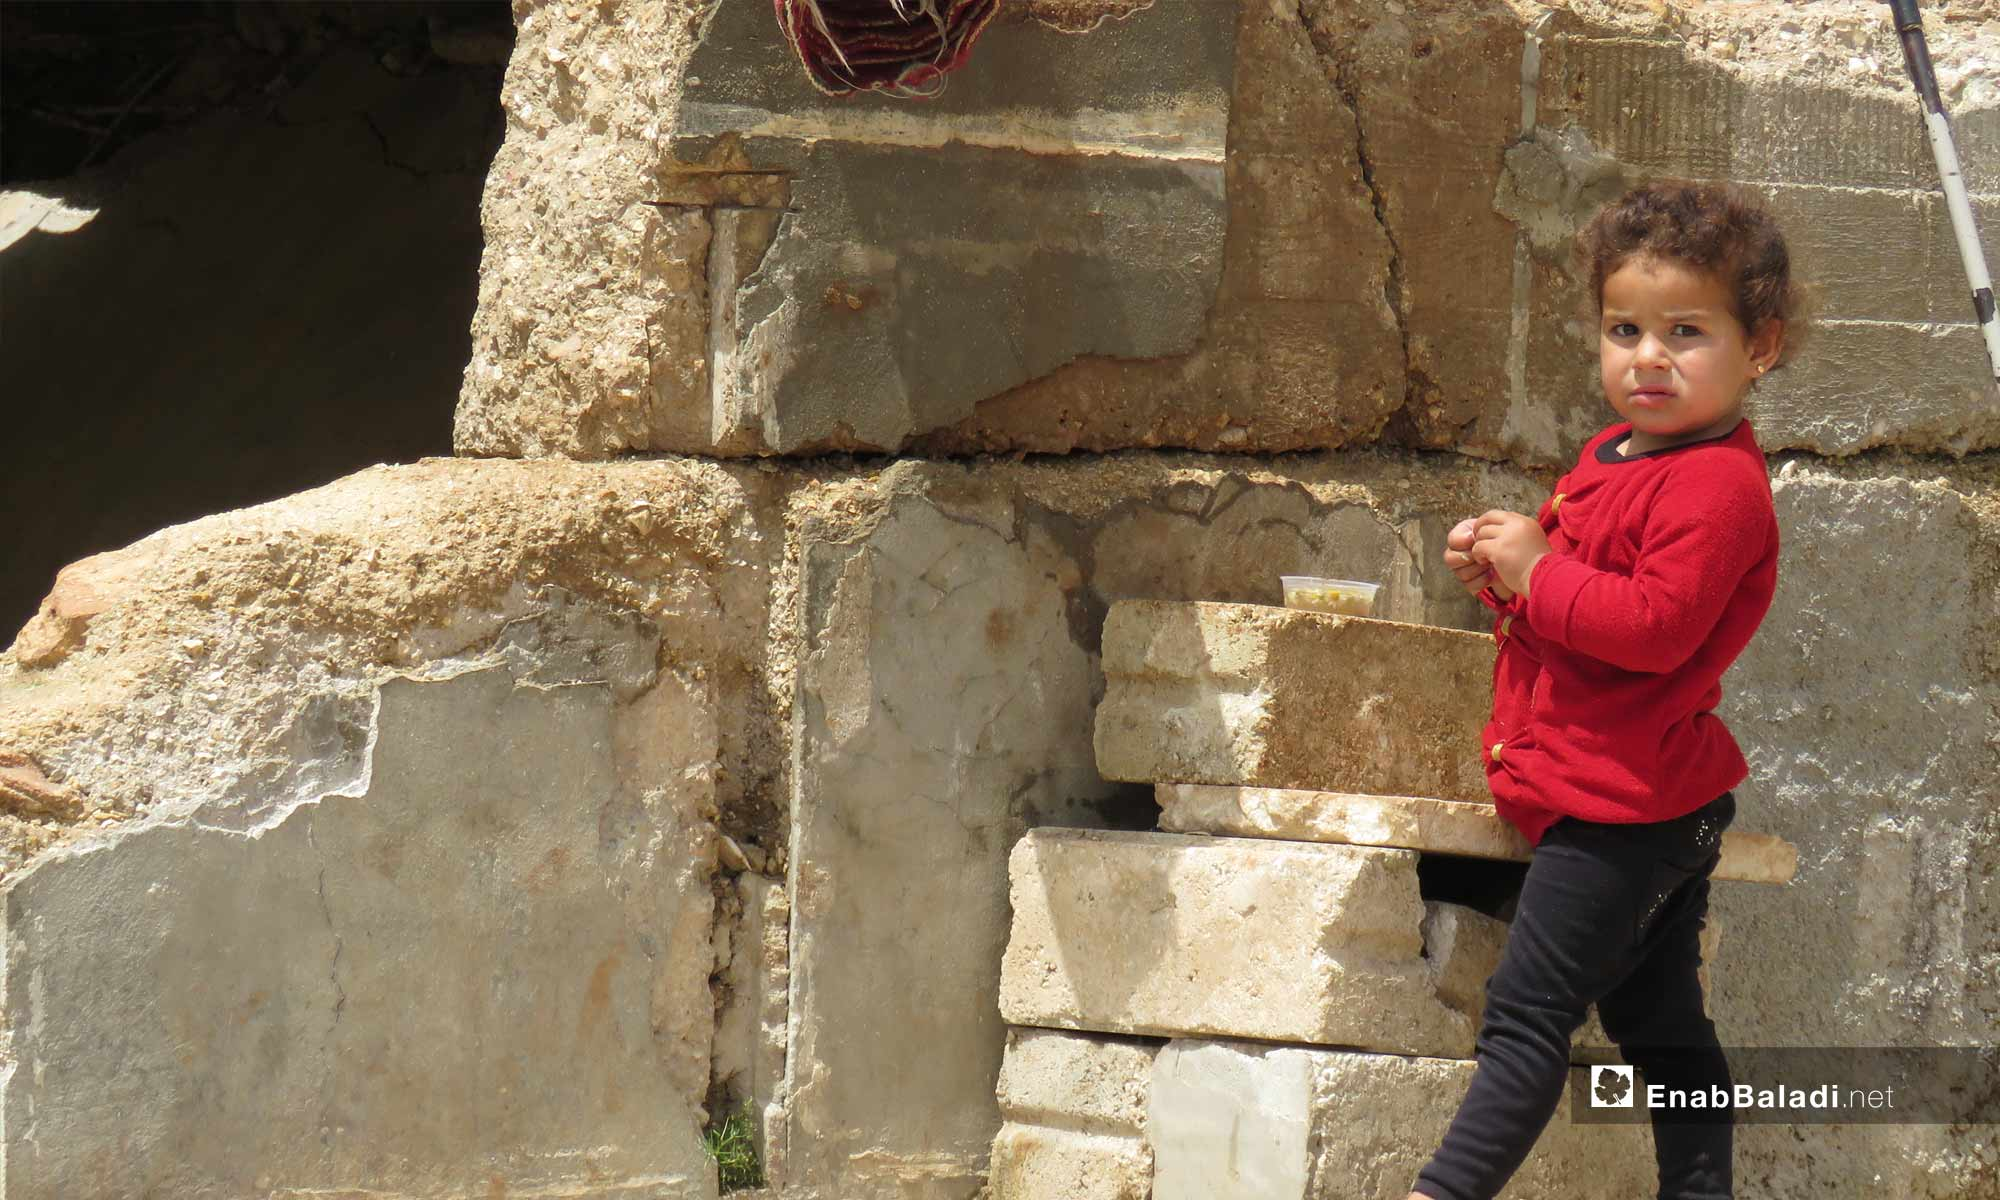 A little child in the town of Kafr Nabudah, northern rural Hama – April 24, 2019 (Enab Baladi)